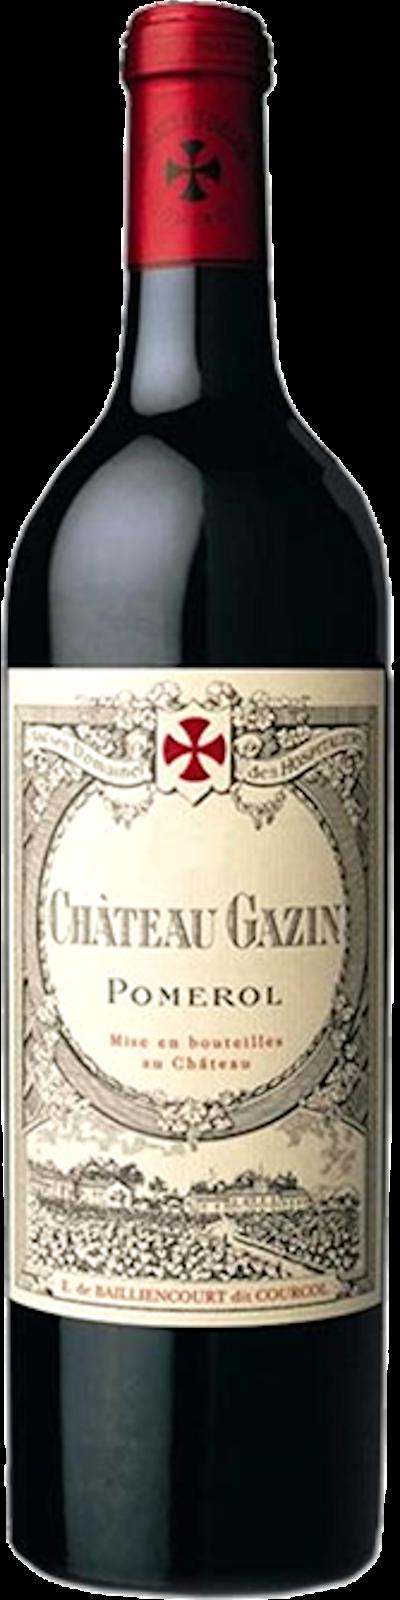 Château Gazin - Pomerol Magnum